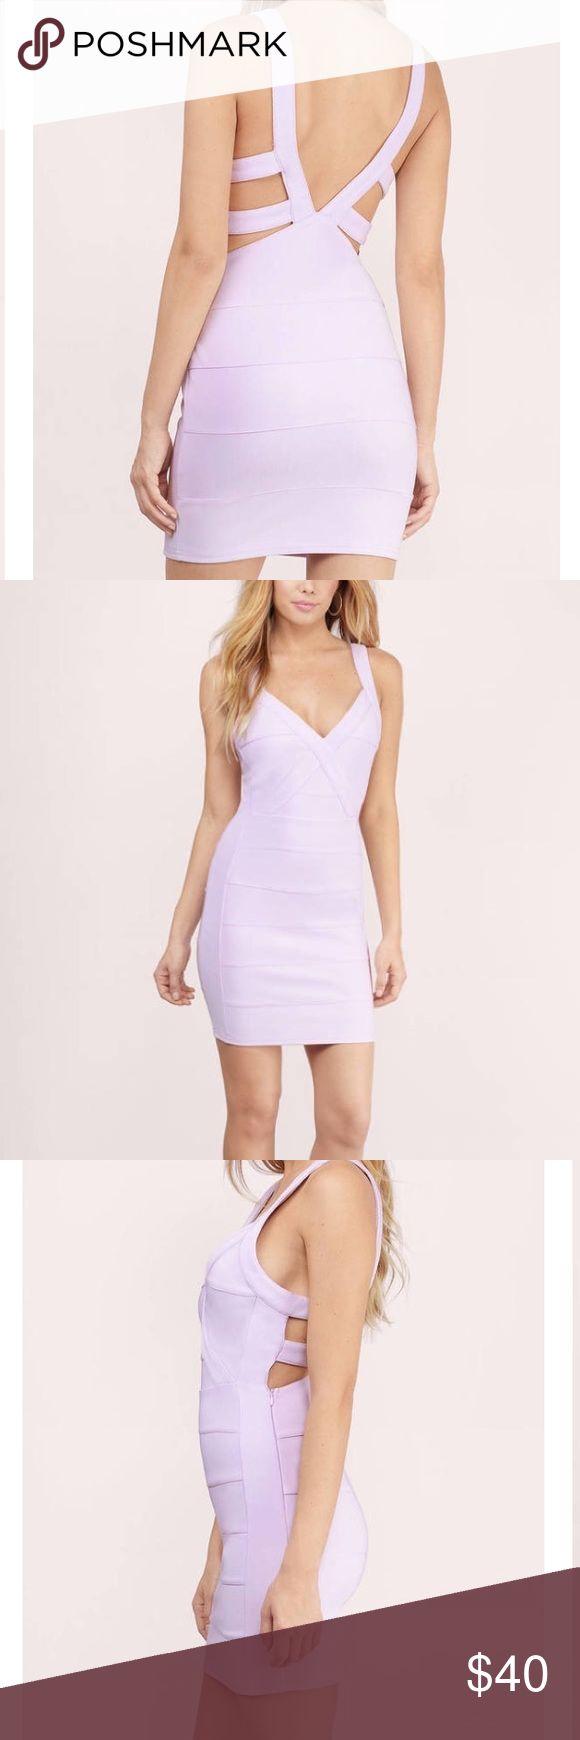 Tobi lavender bandage bodycon dress Tobi lavender bandage bodycon dress. Size small. Love this dress! Too large in the bust for me :( sadly NWT Tobi Dresses